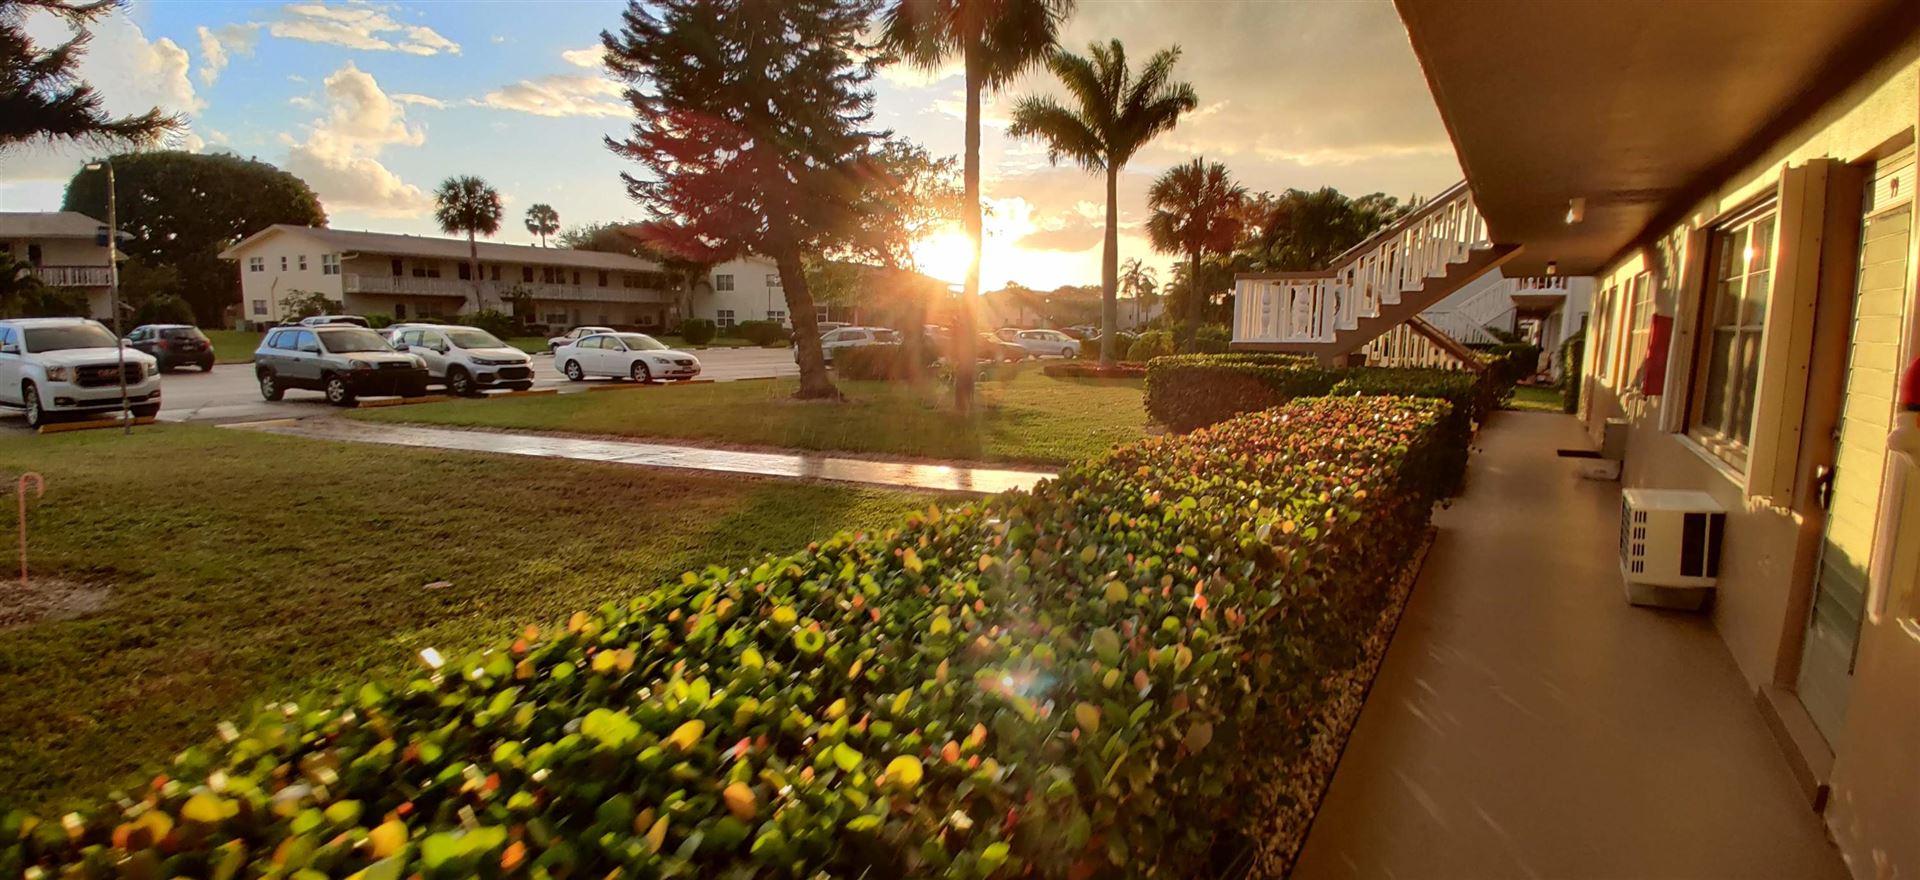 99 Norwich E, West Palm Beach, FL 33417 - #: RX-10680499